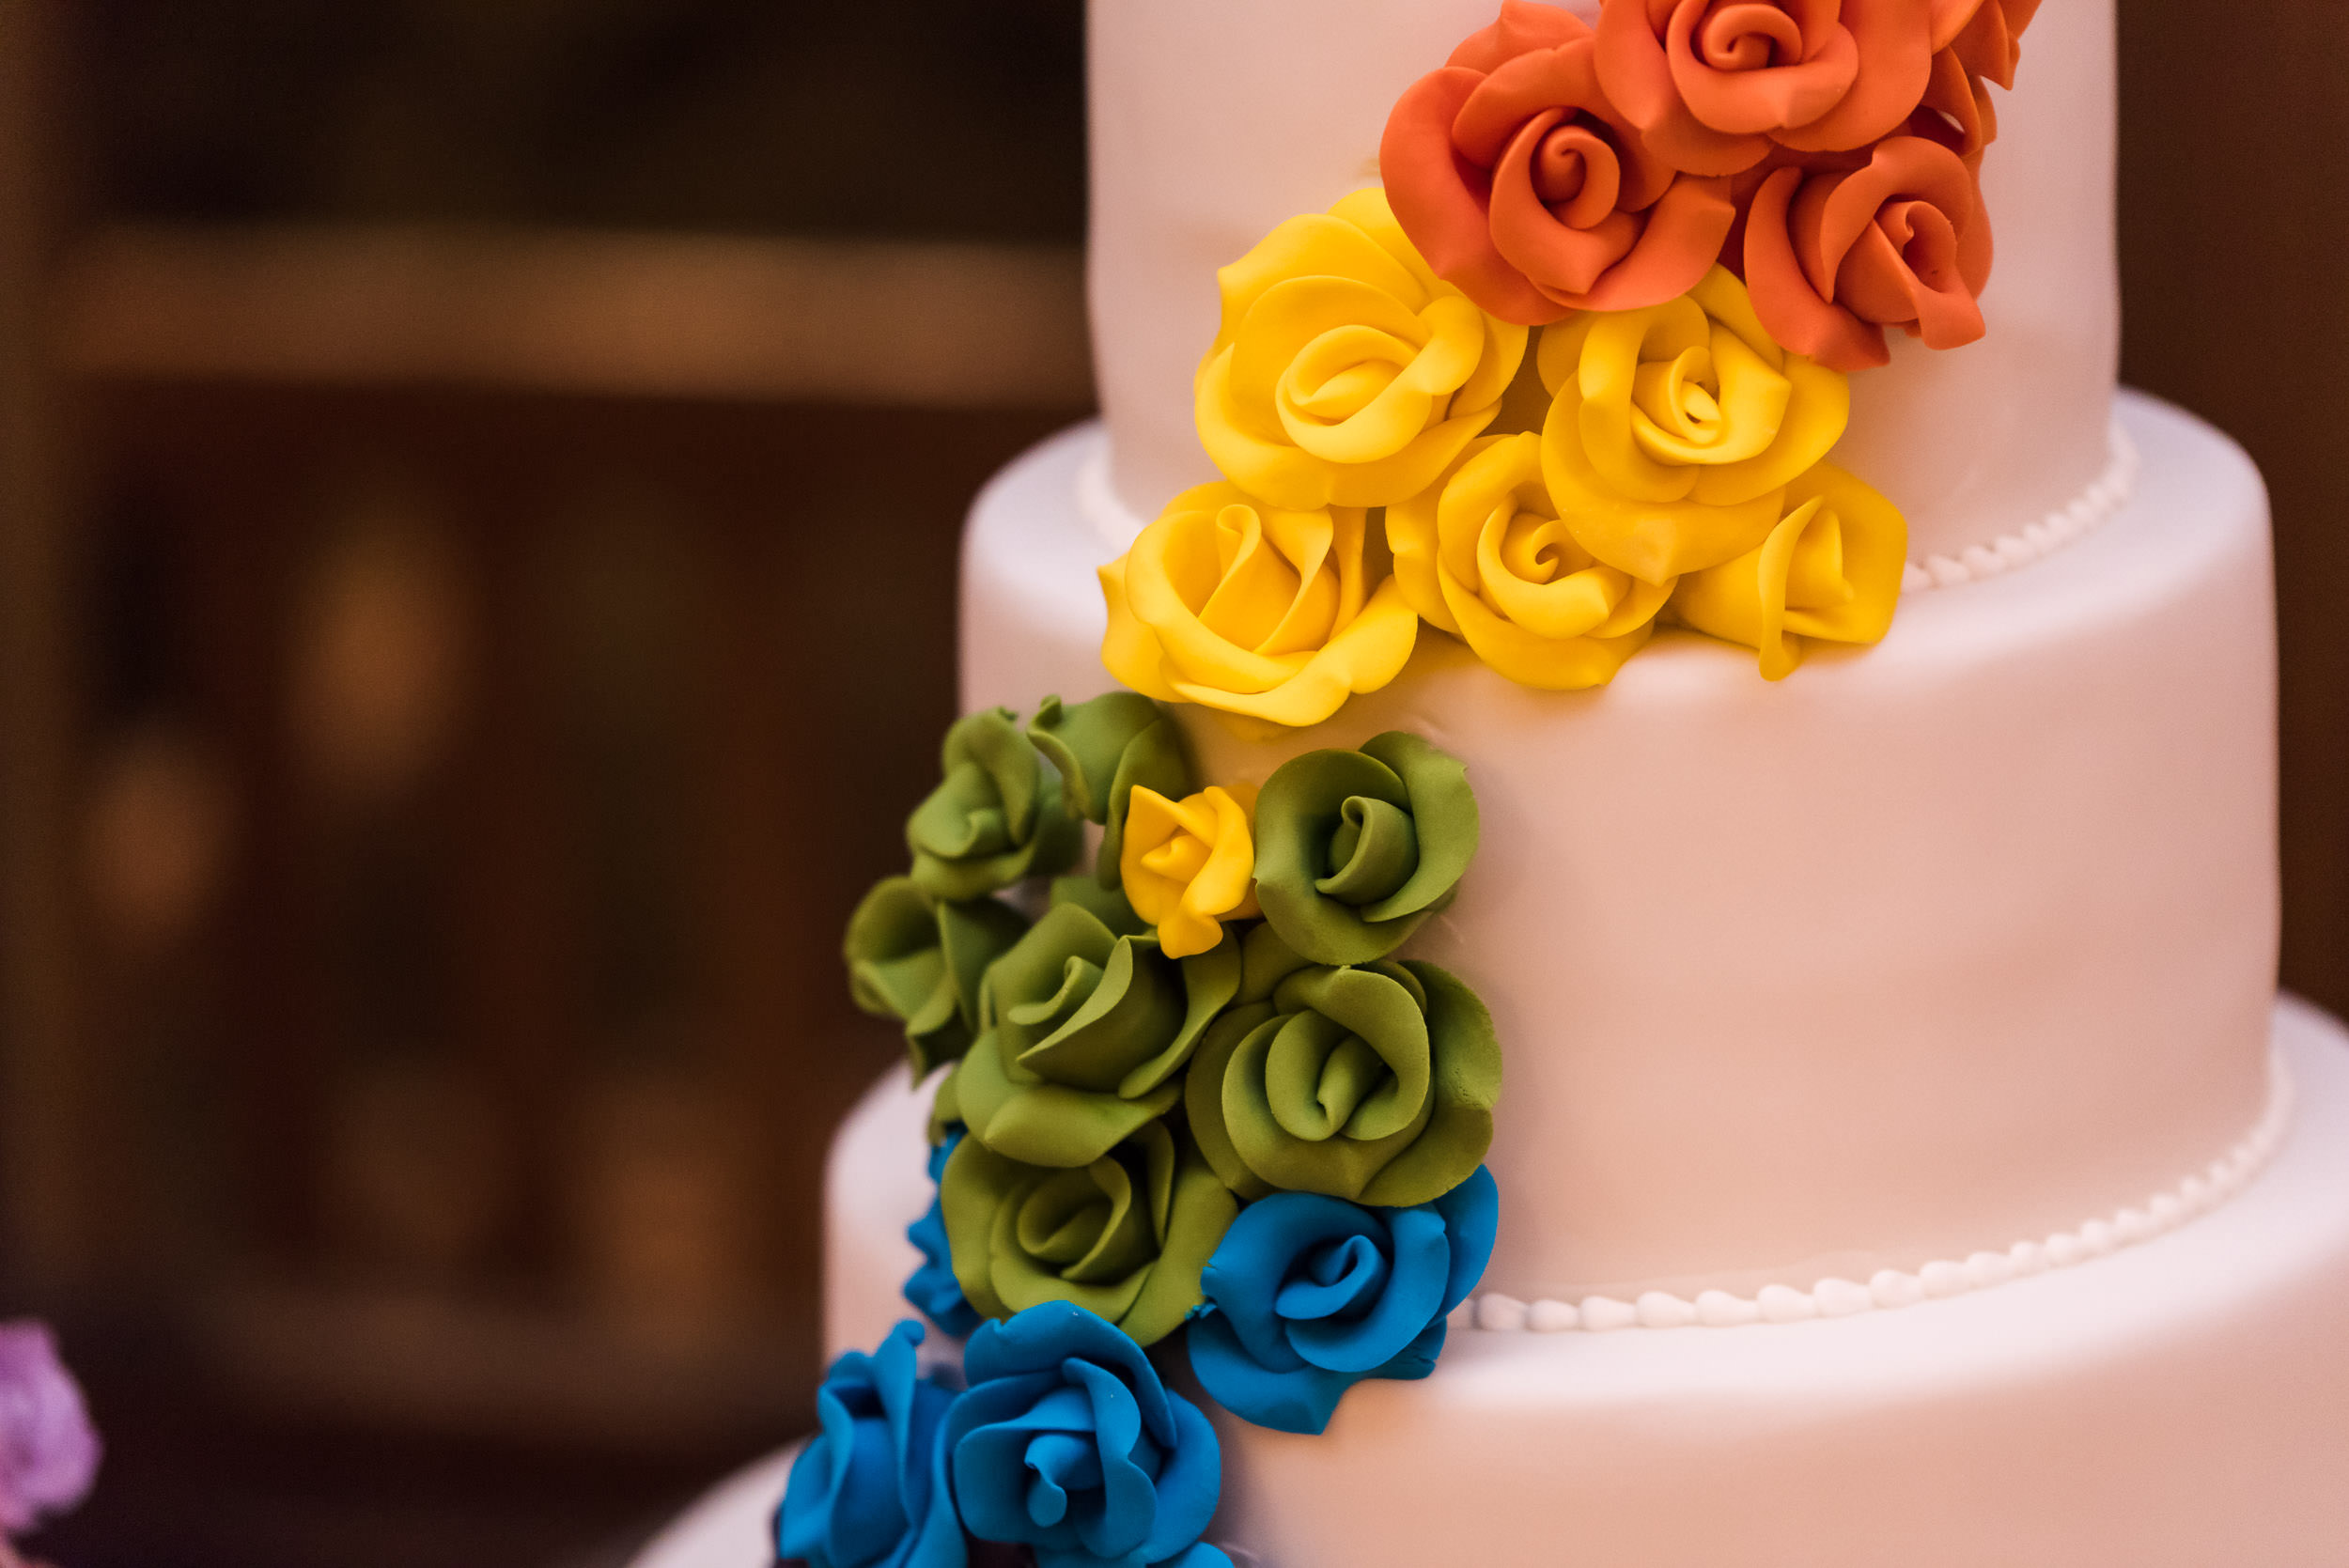 NC-20170909-2017-09-09_livvy-and-alice-wedding-0075.jpg